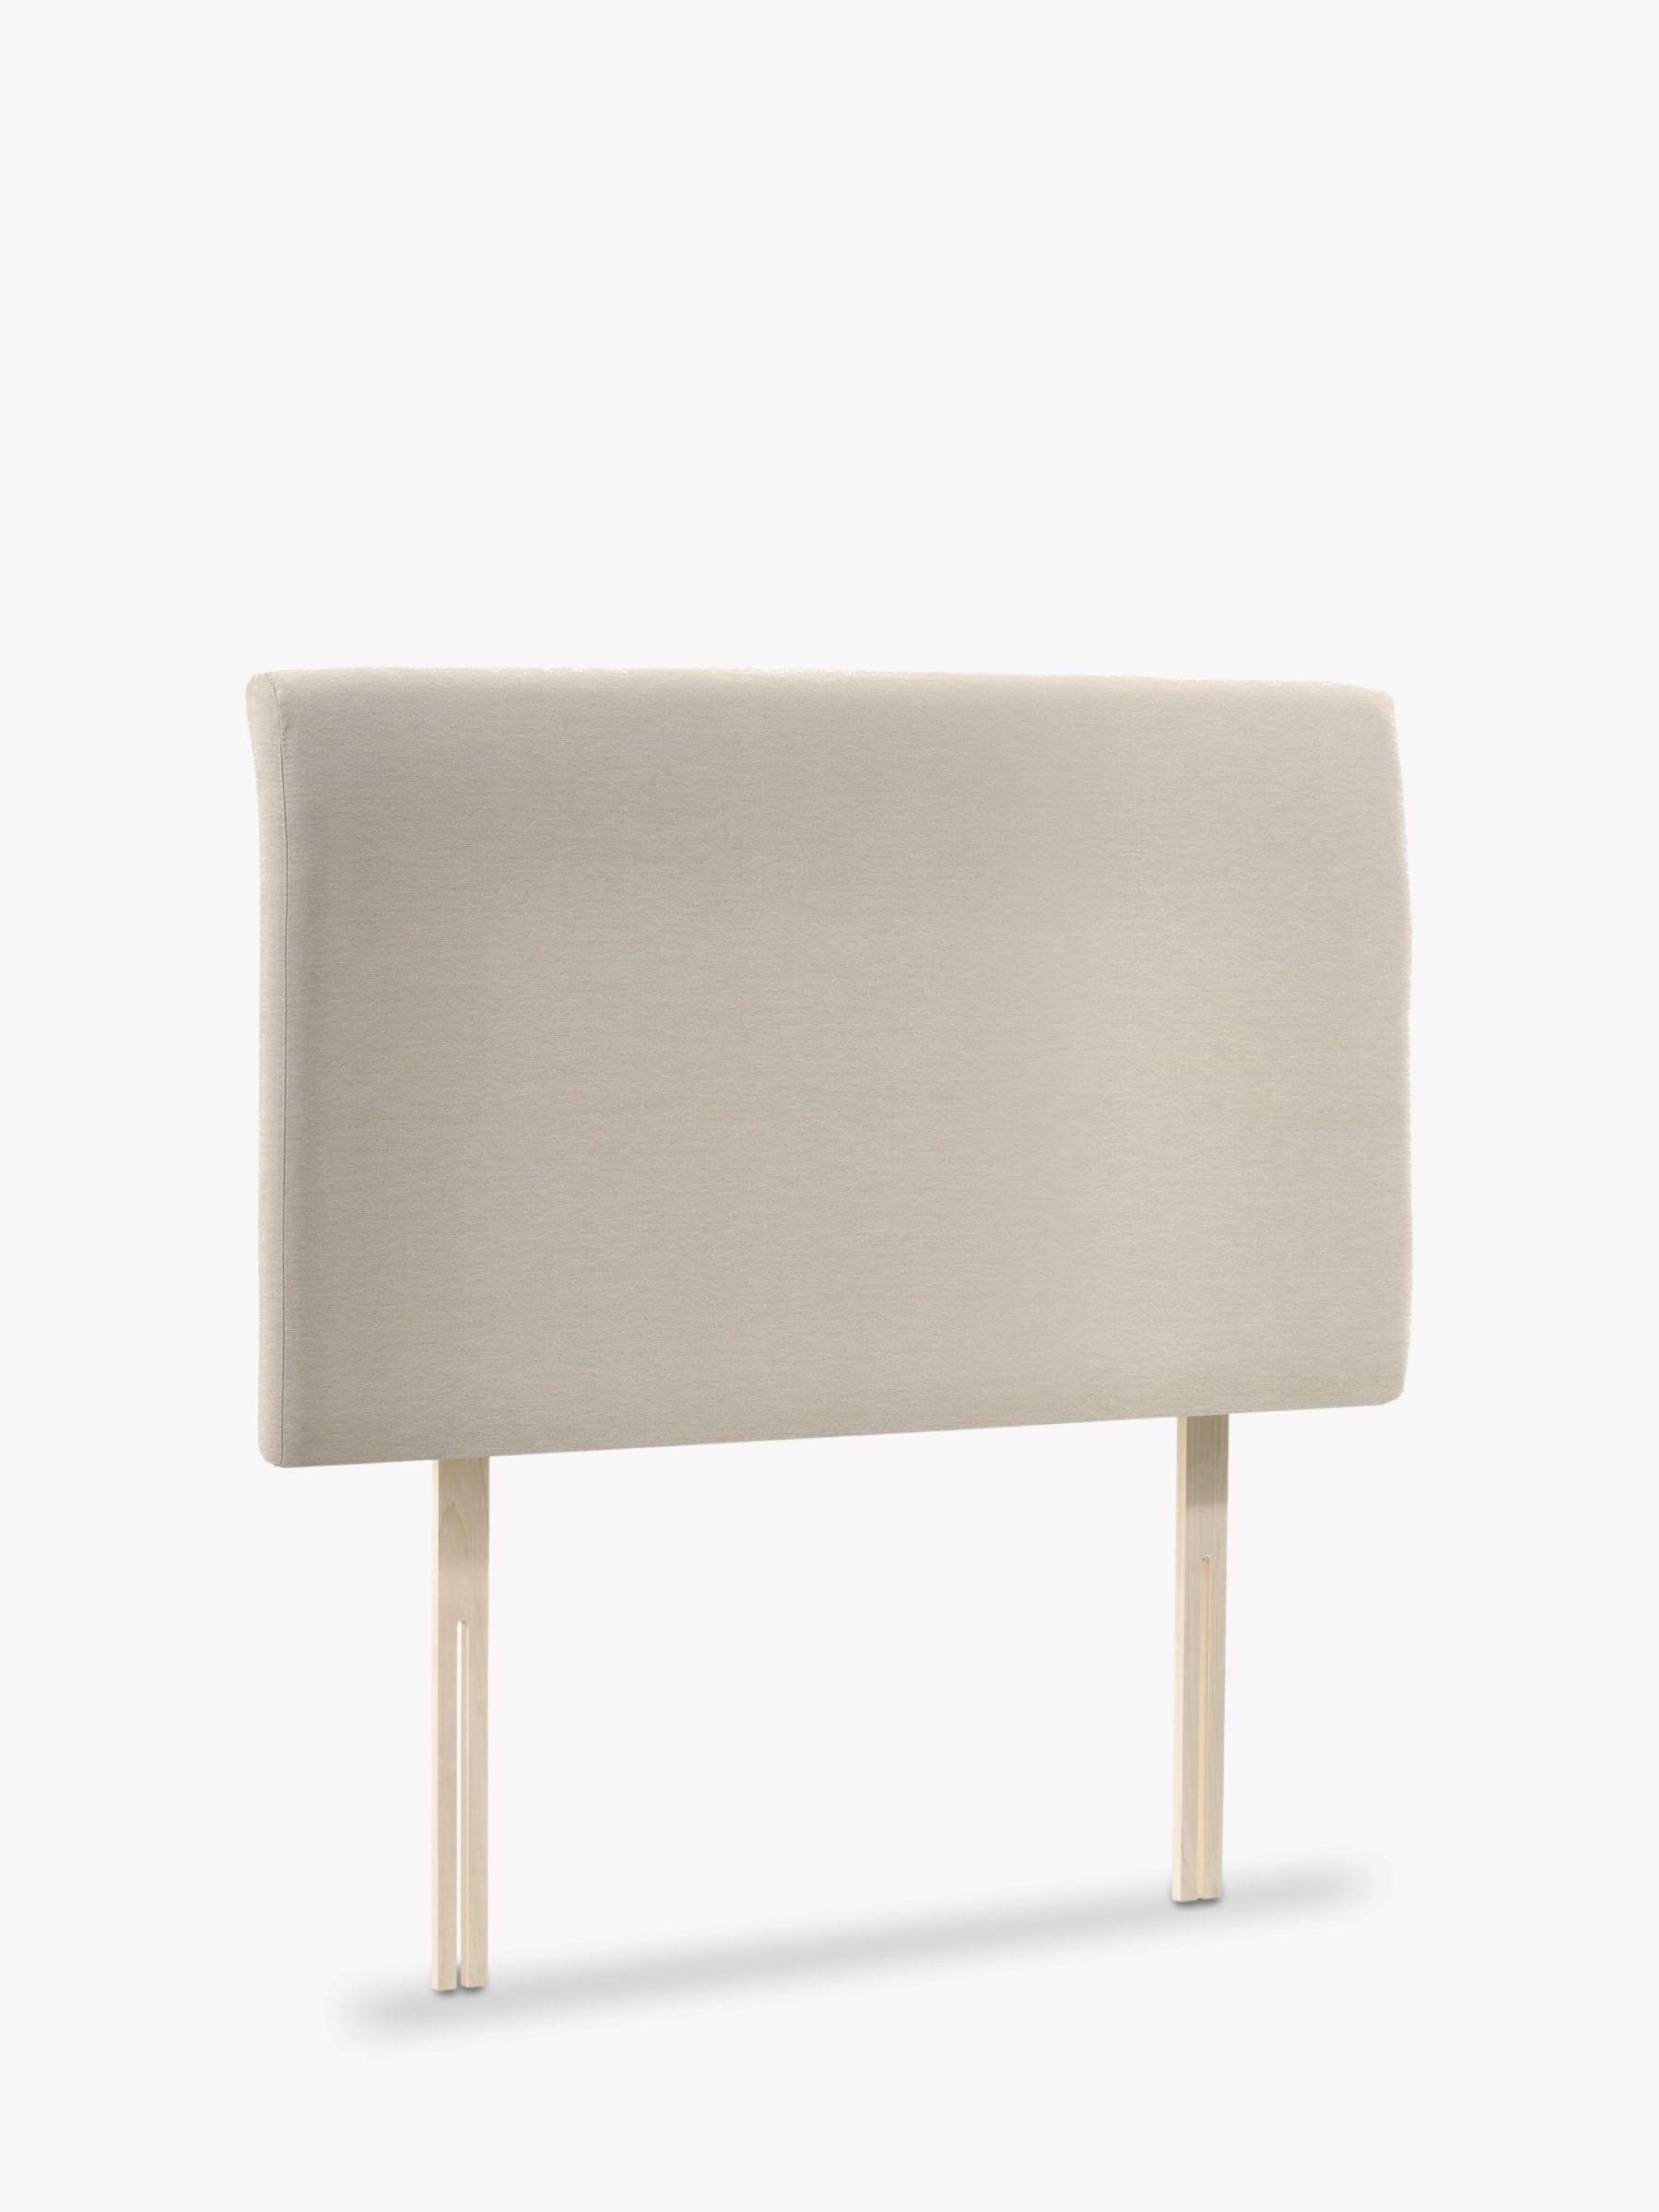 John Lewis & Partners Bedford Upholstered Headboard, Single, FSC Certified (Softwood)